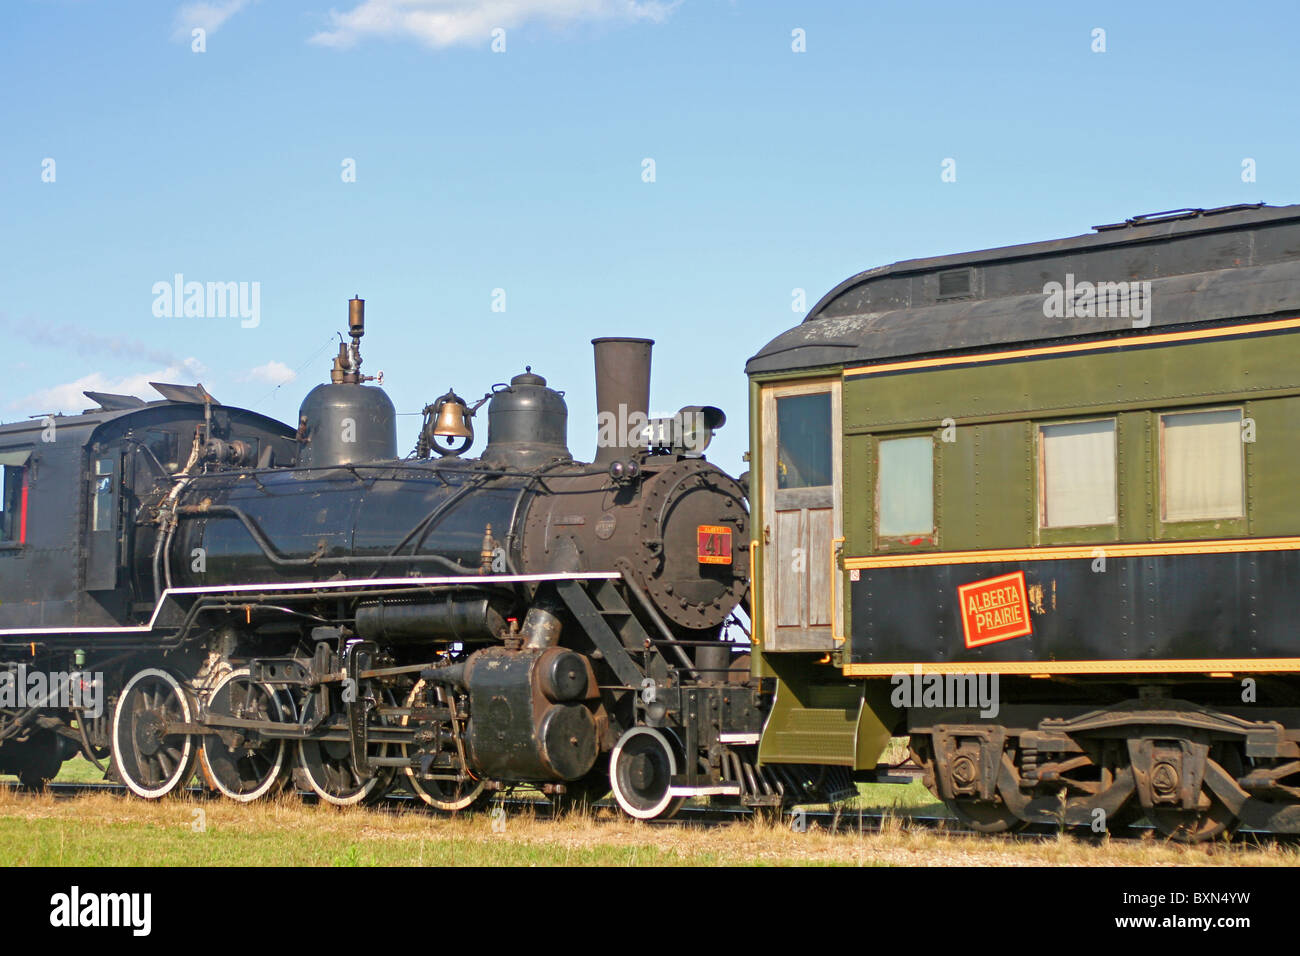 Steam Train Locomotive and Passenger car - Stock Image